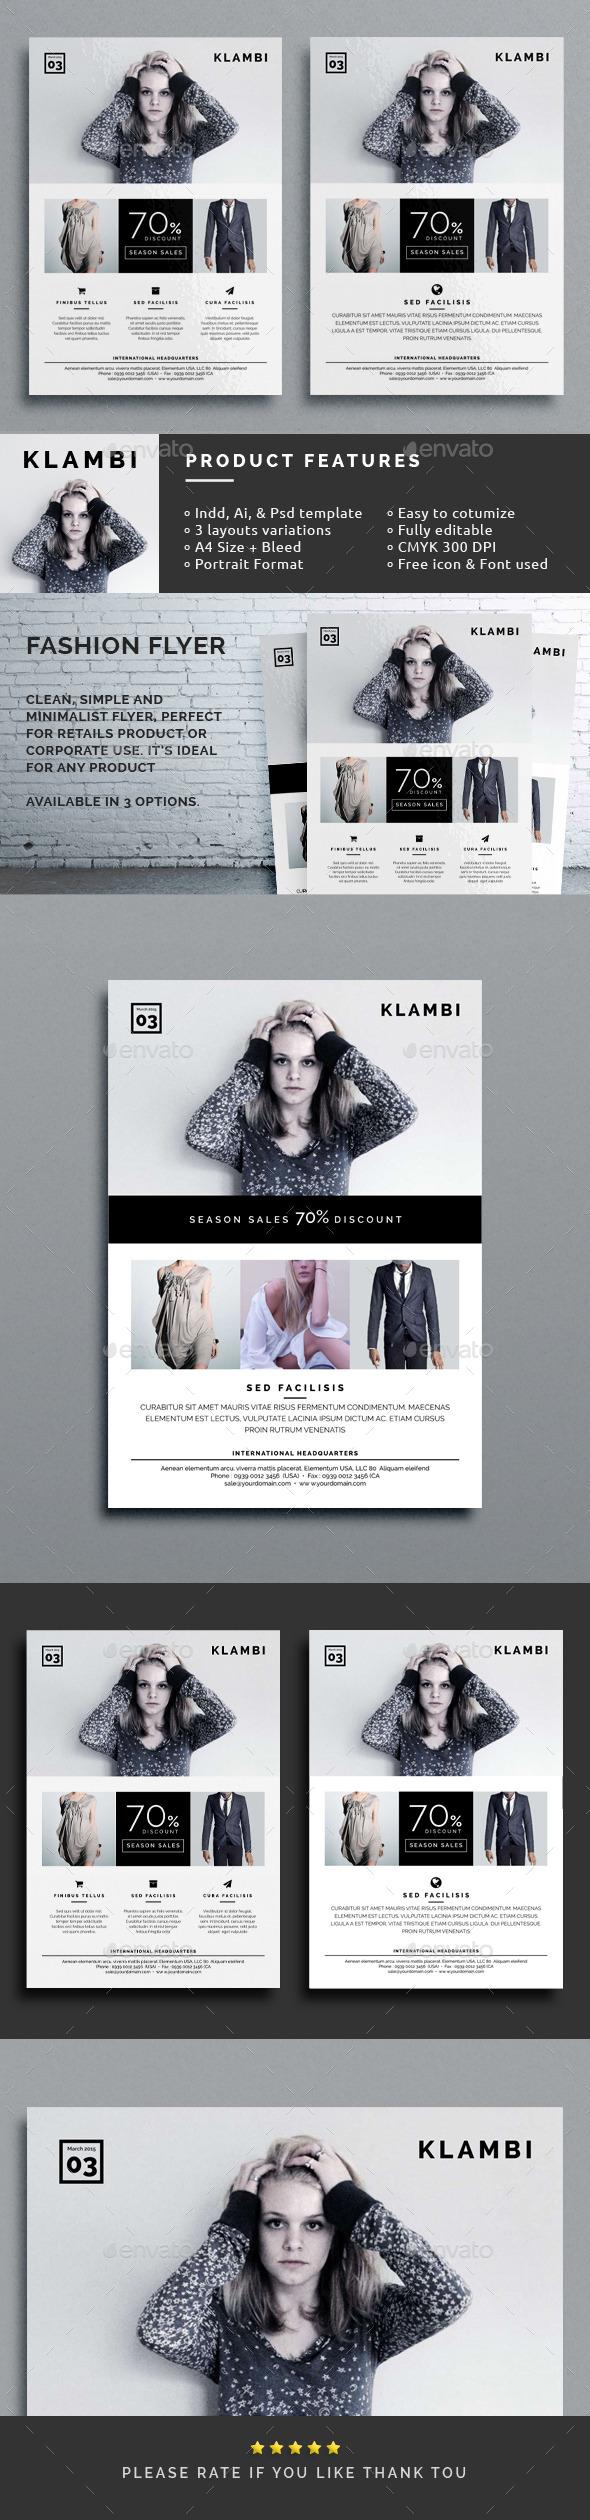 Klambi Fashion Flyer  - Corporate Flyers